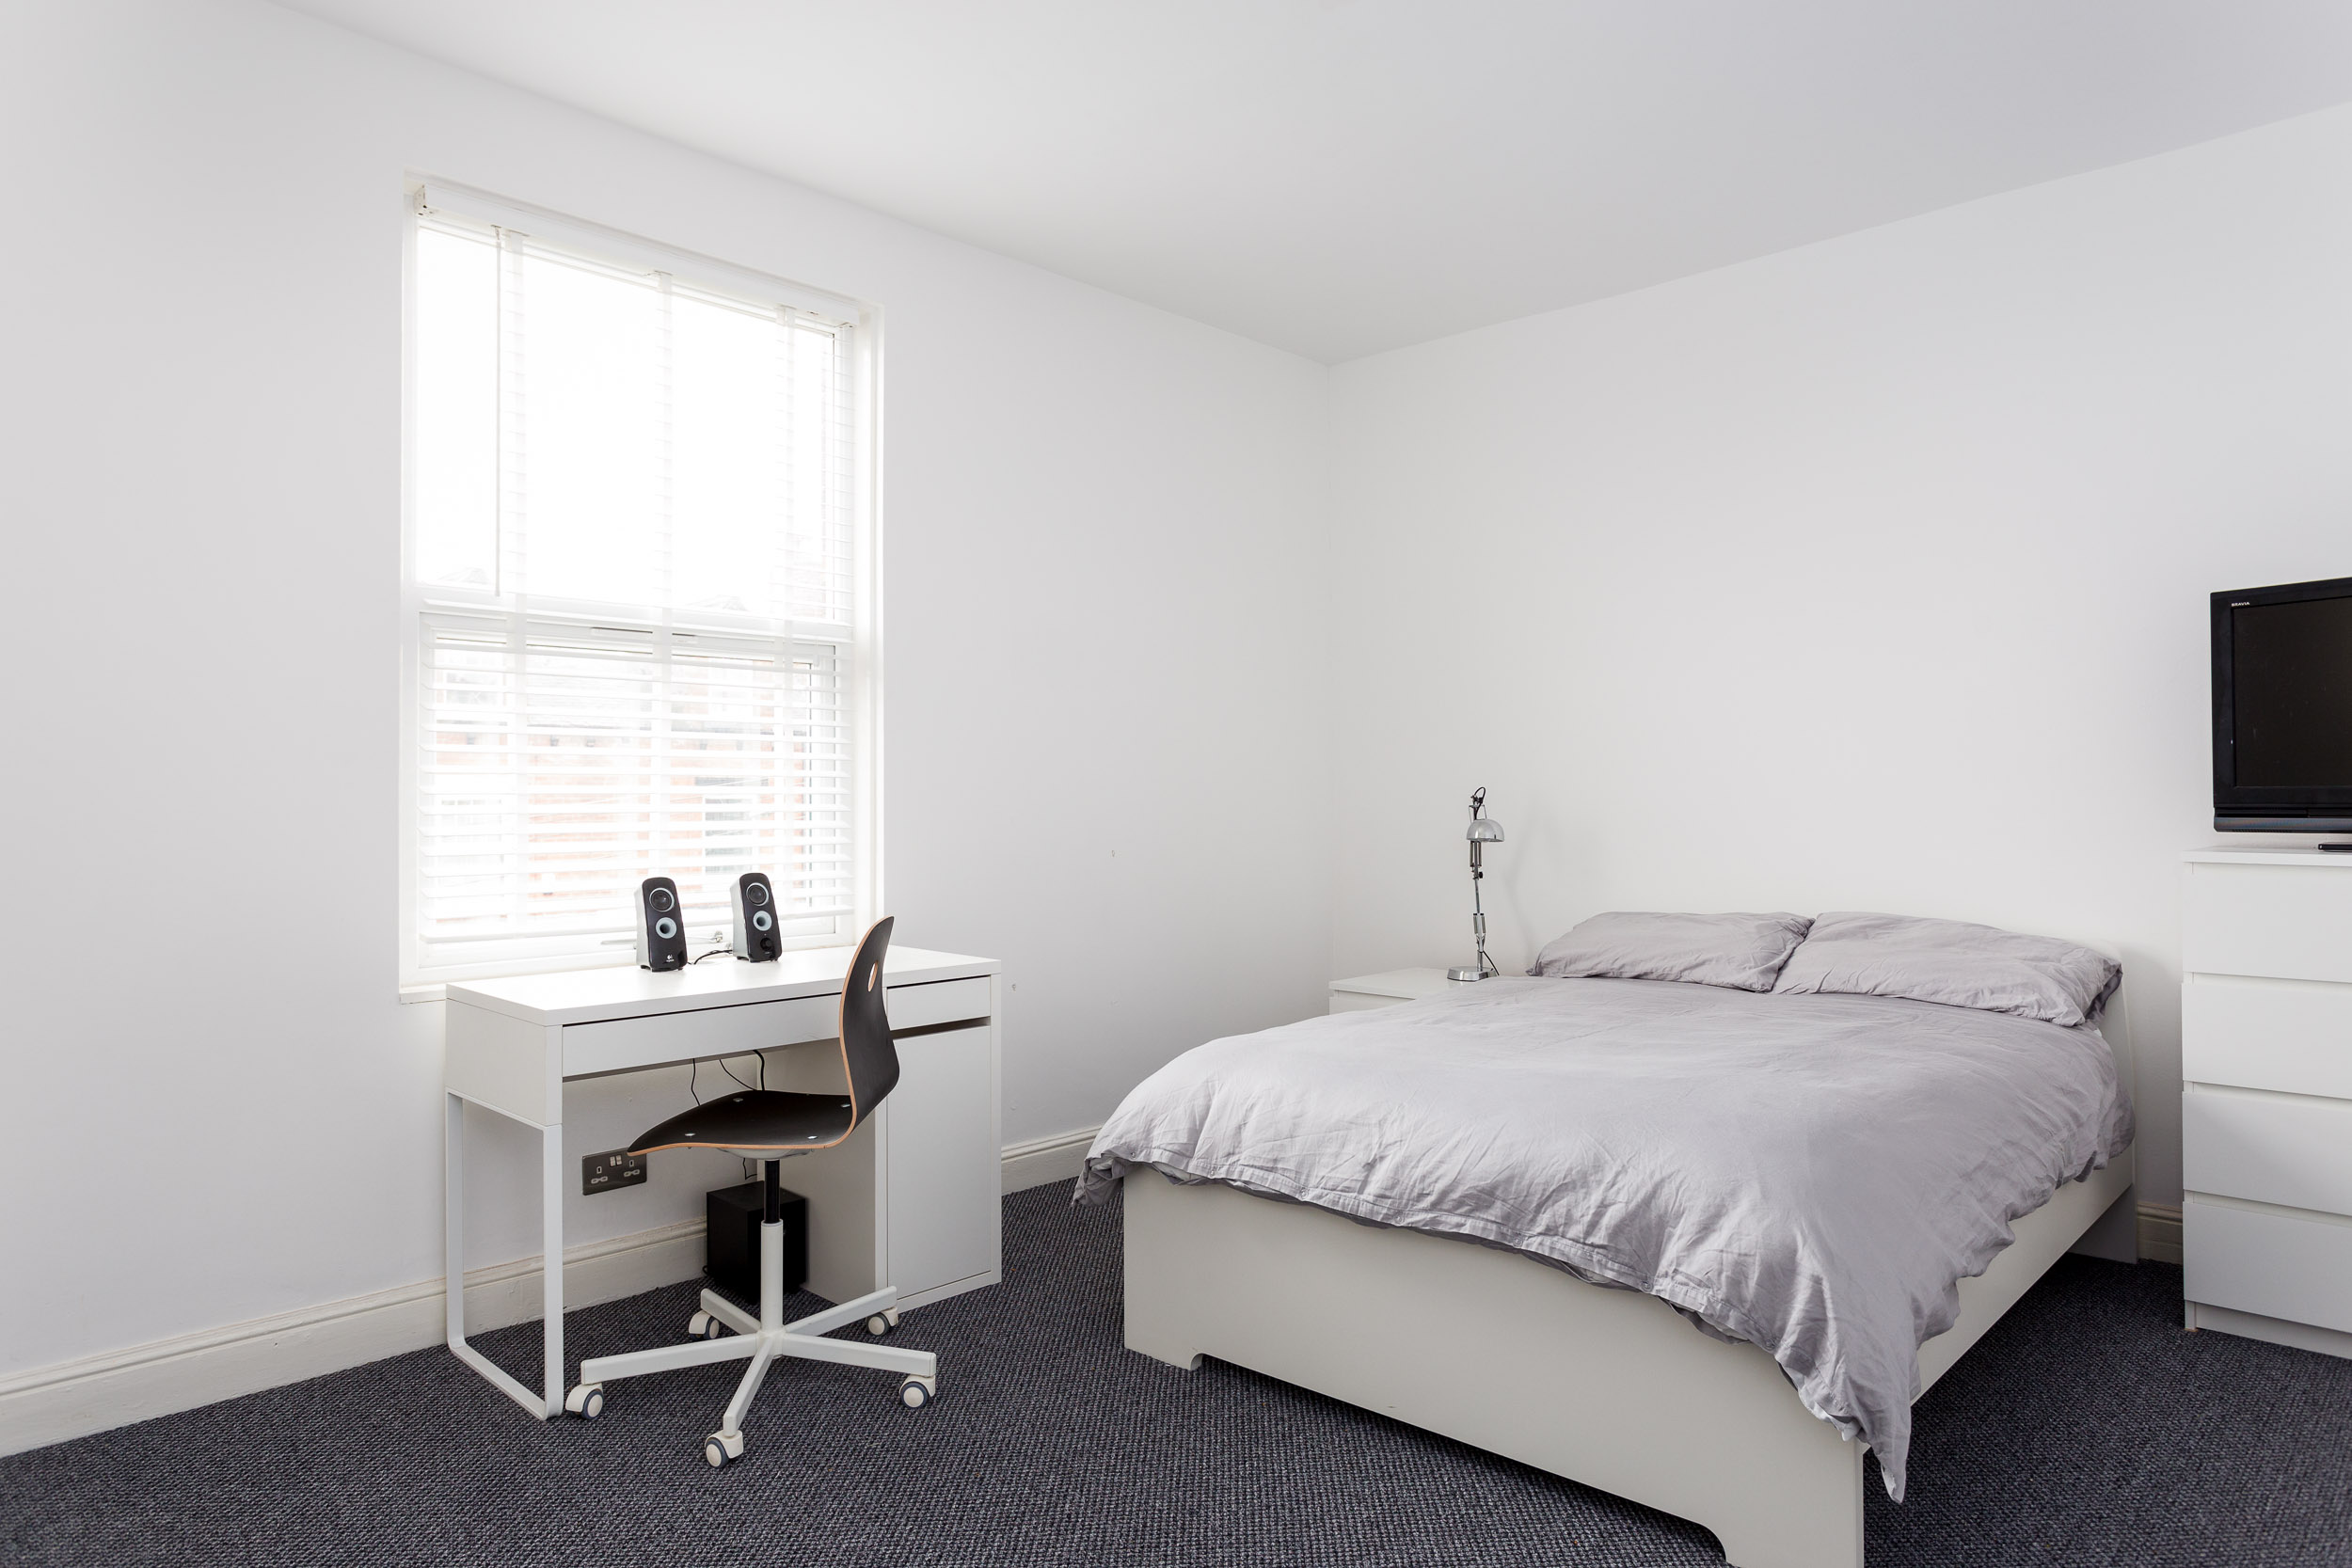 grimthorpe property photography leeds west yorkshire bedroom 1.jpg